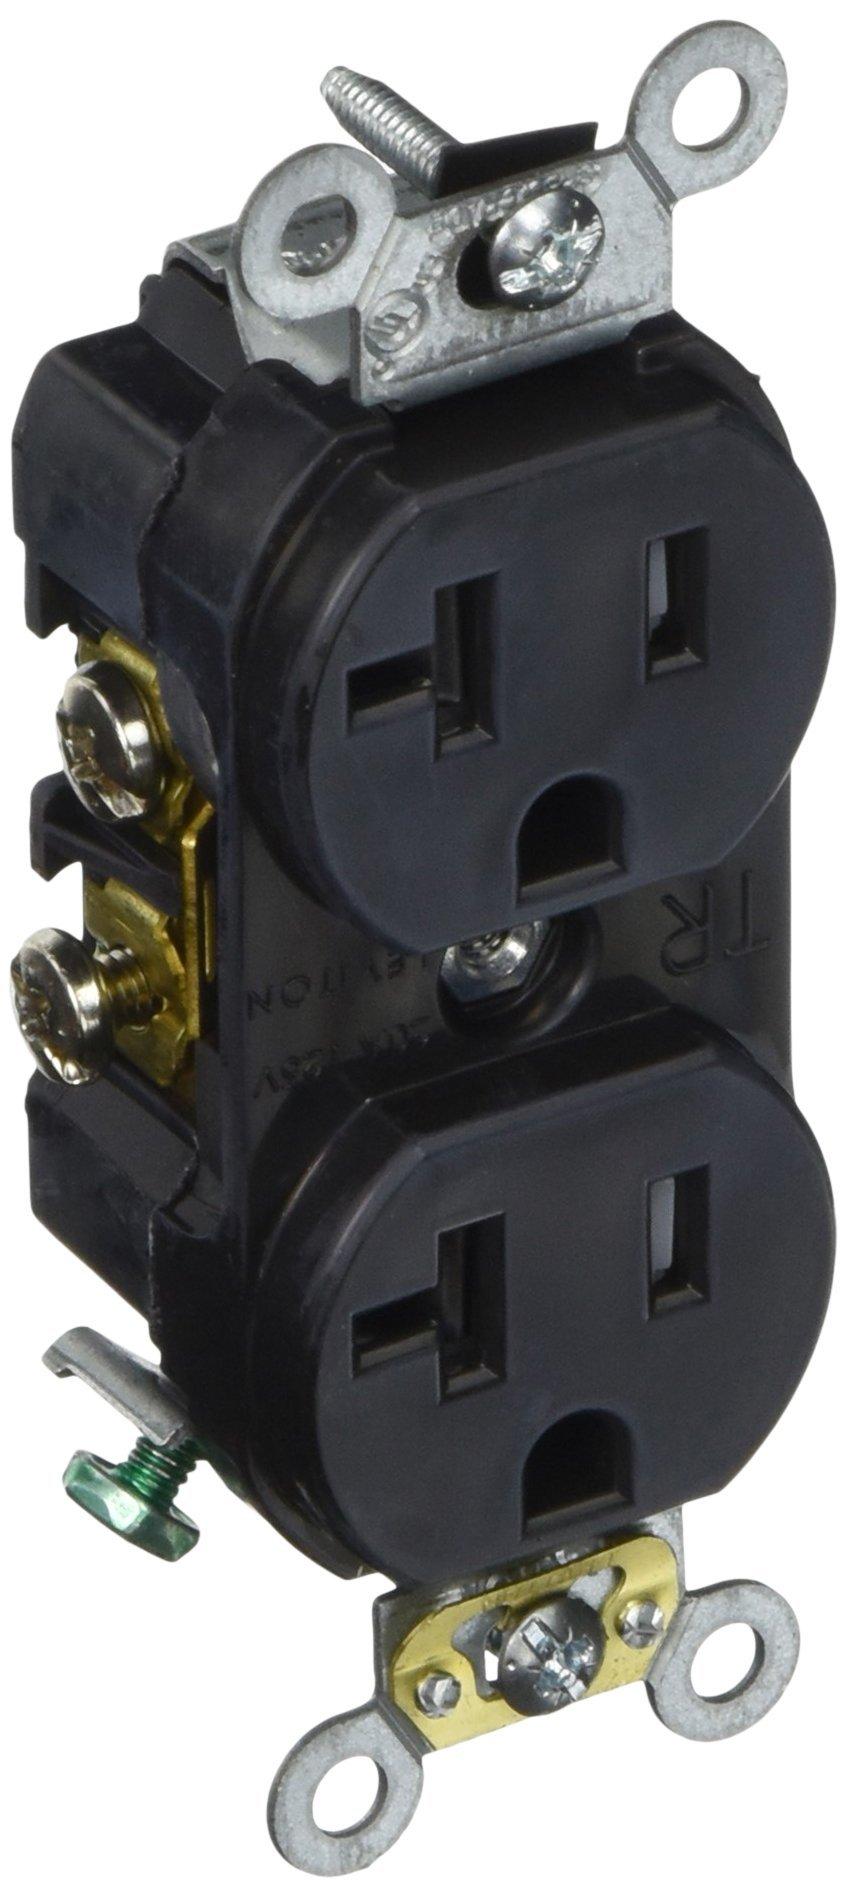 Leviton TBR20-E 20-Amp, 125-Volt, Tamper-Resistant, Duplex Receptacle, Straight Blade, Commercial Grade, Self Grounding, Black